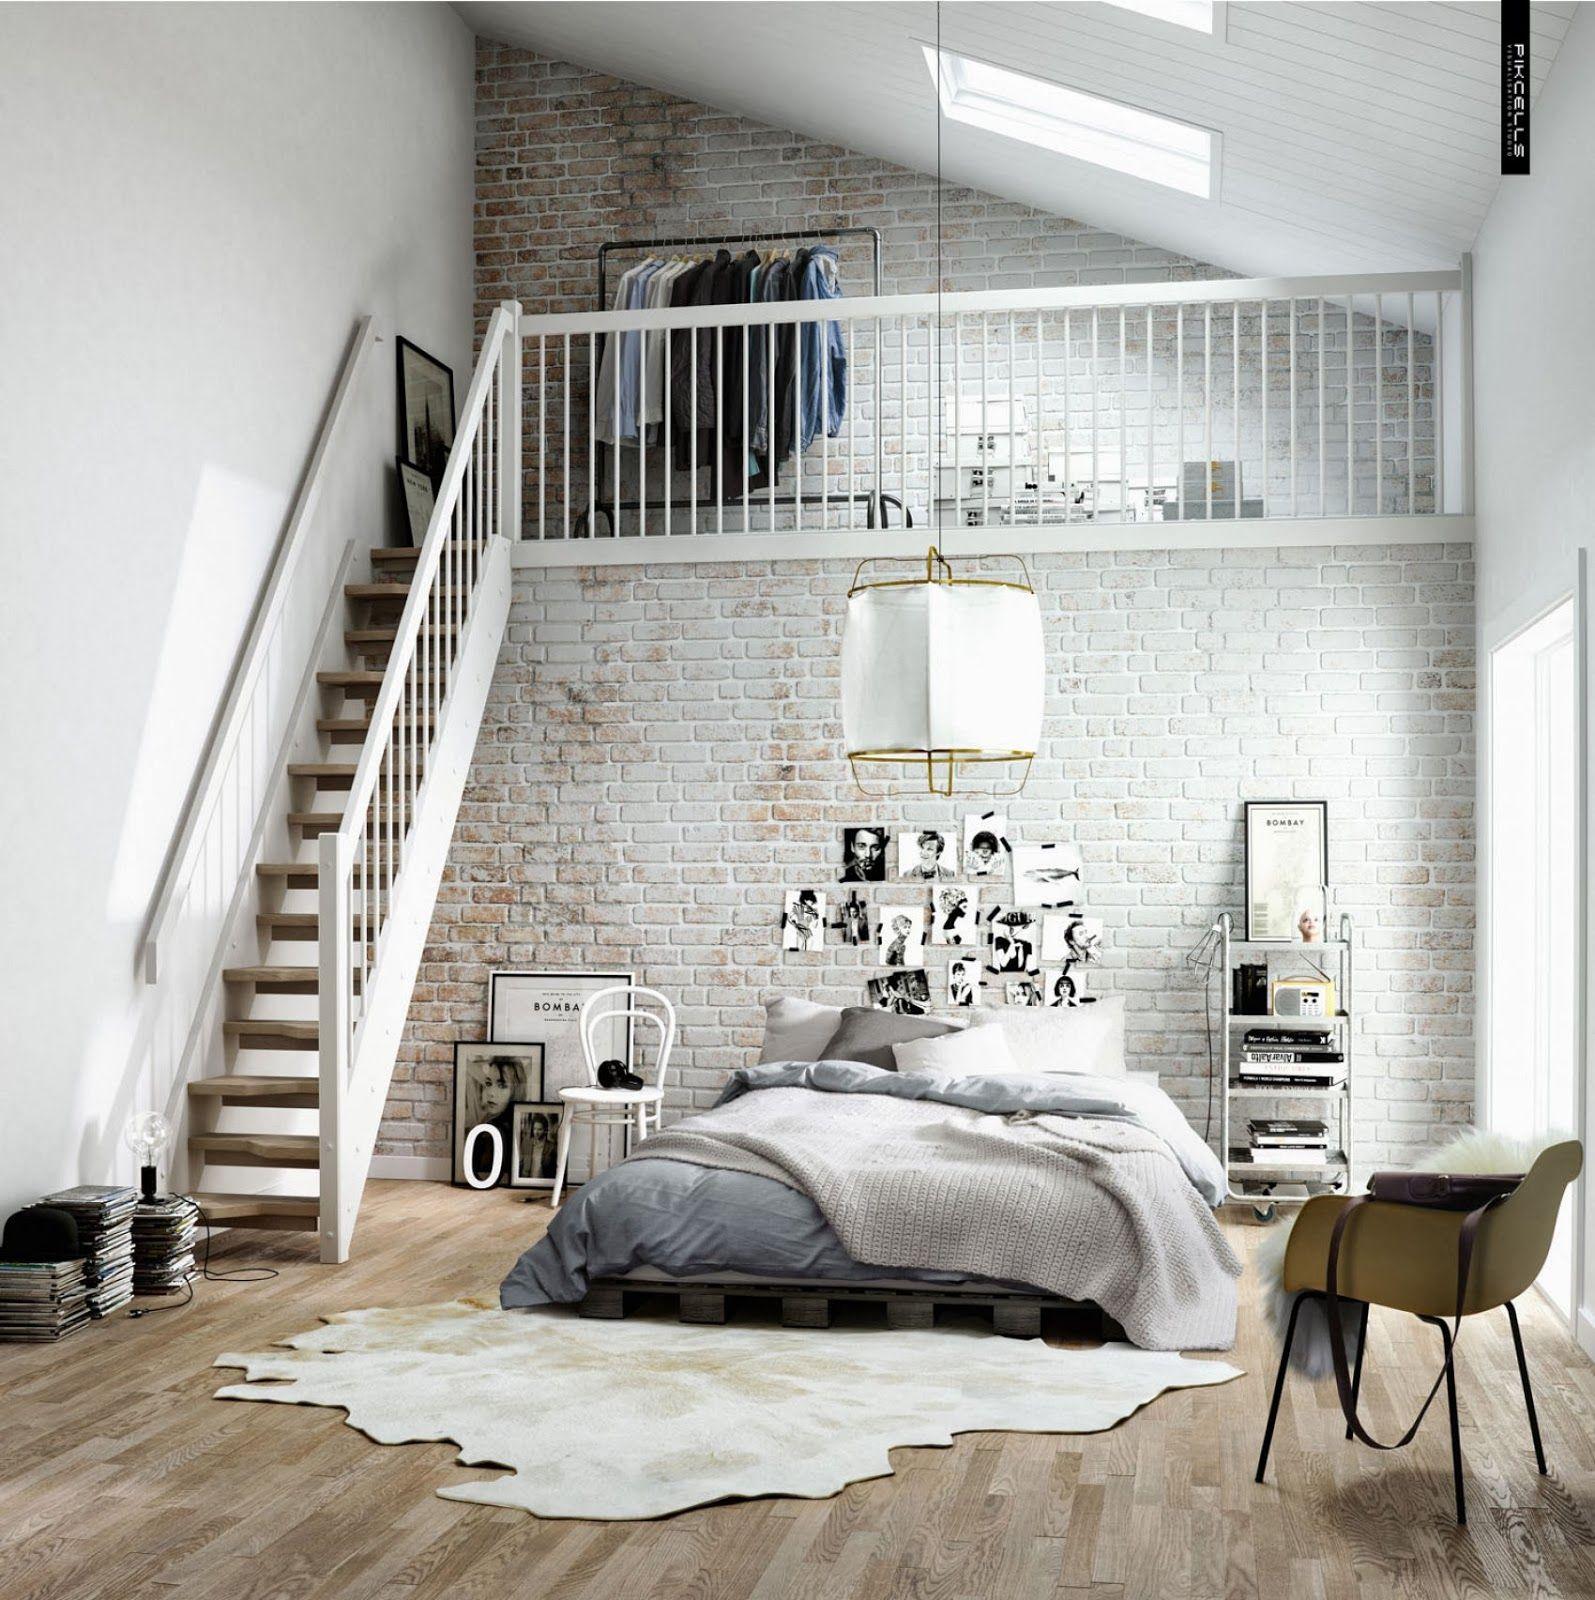 4 bedroom loft  I love this flooringbpspotDHzPSATJs